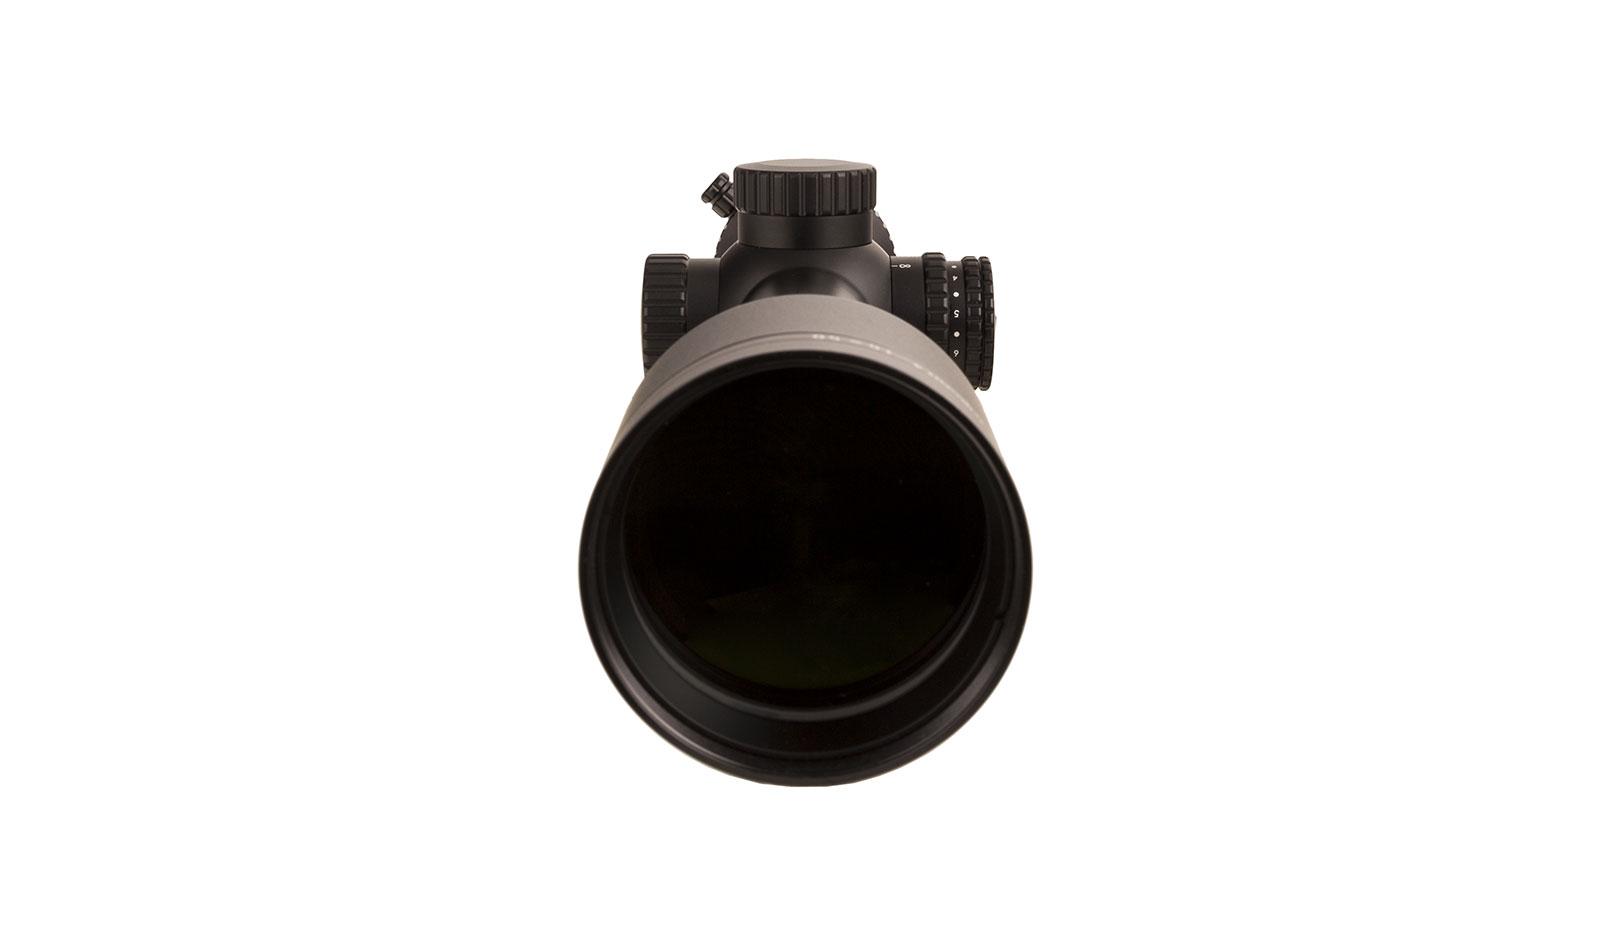 CRHX1650-C-2900006 angle 8